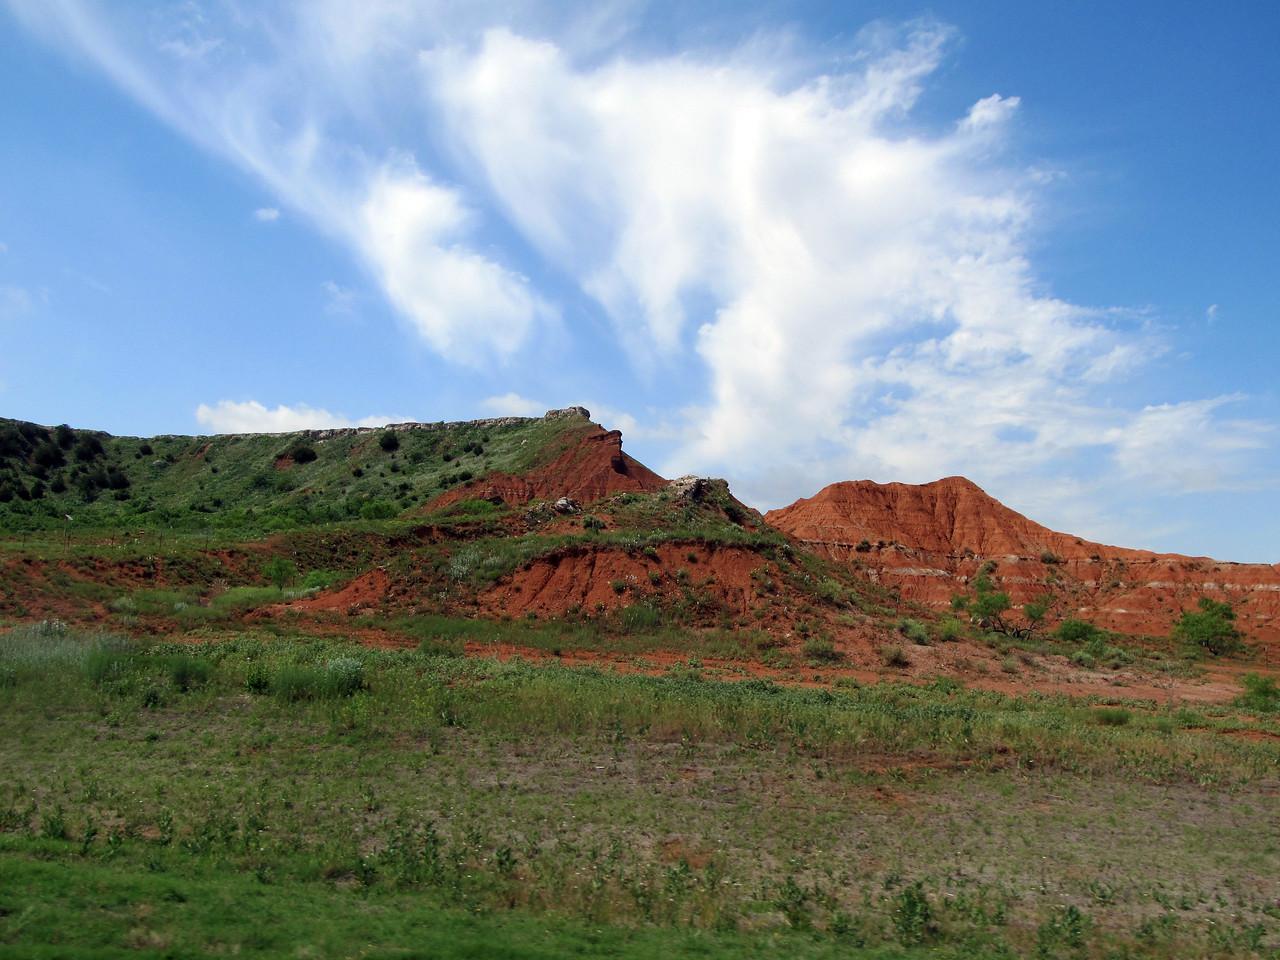 Oklahoma Bluffs